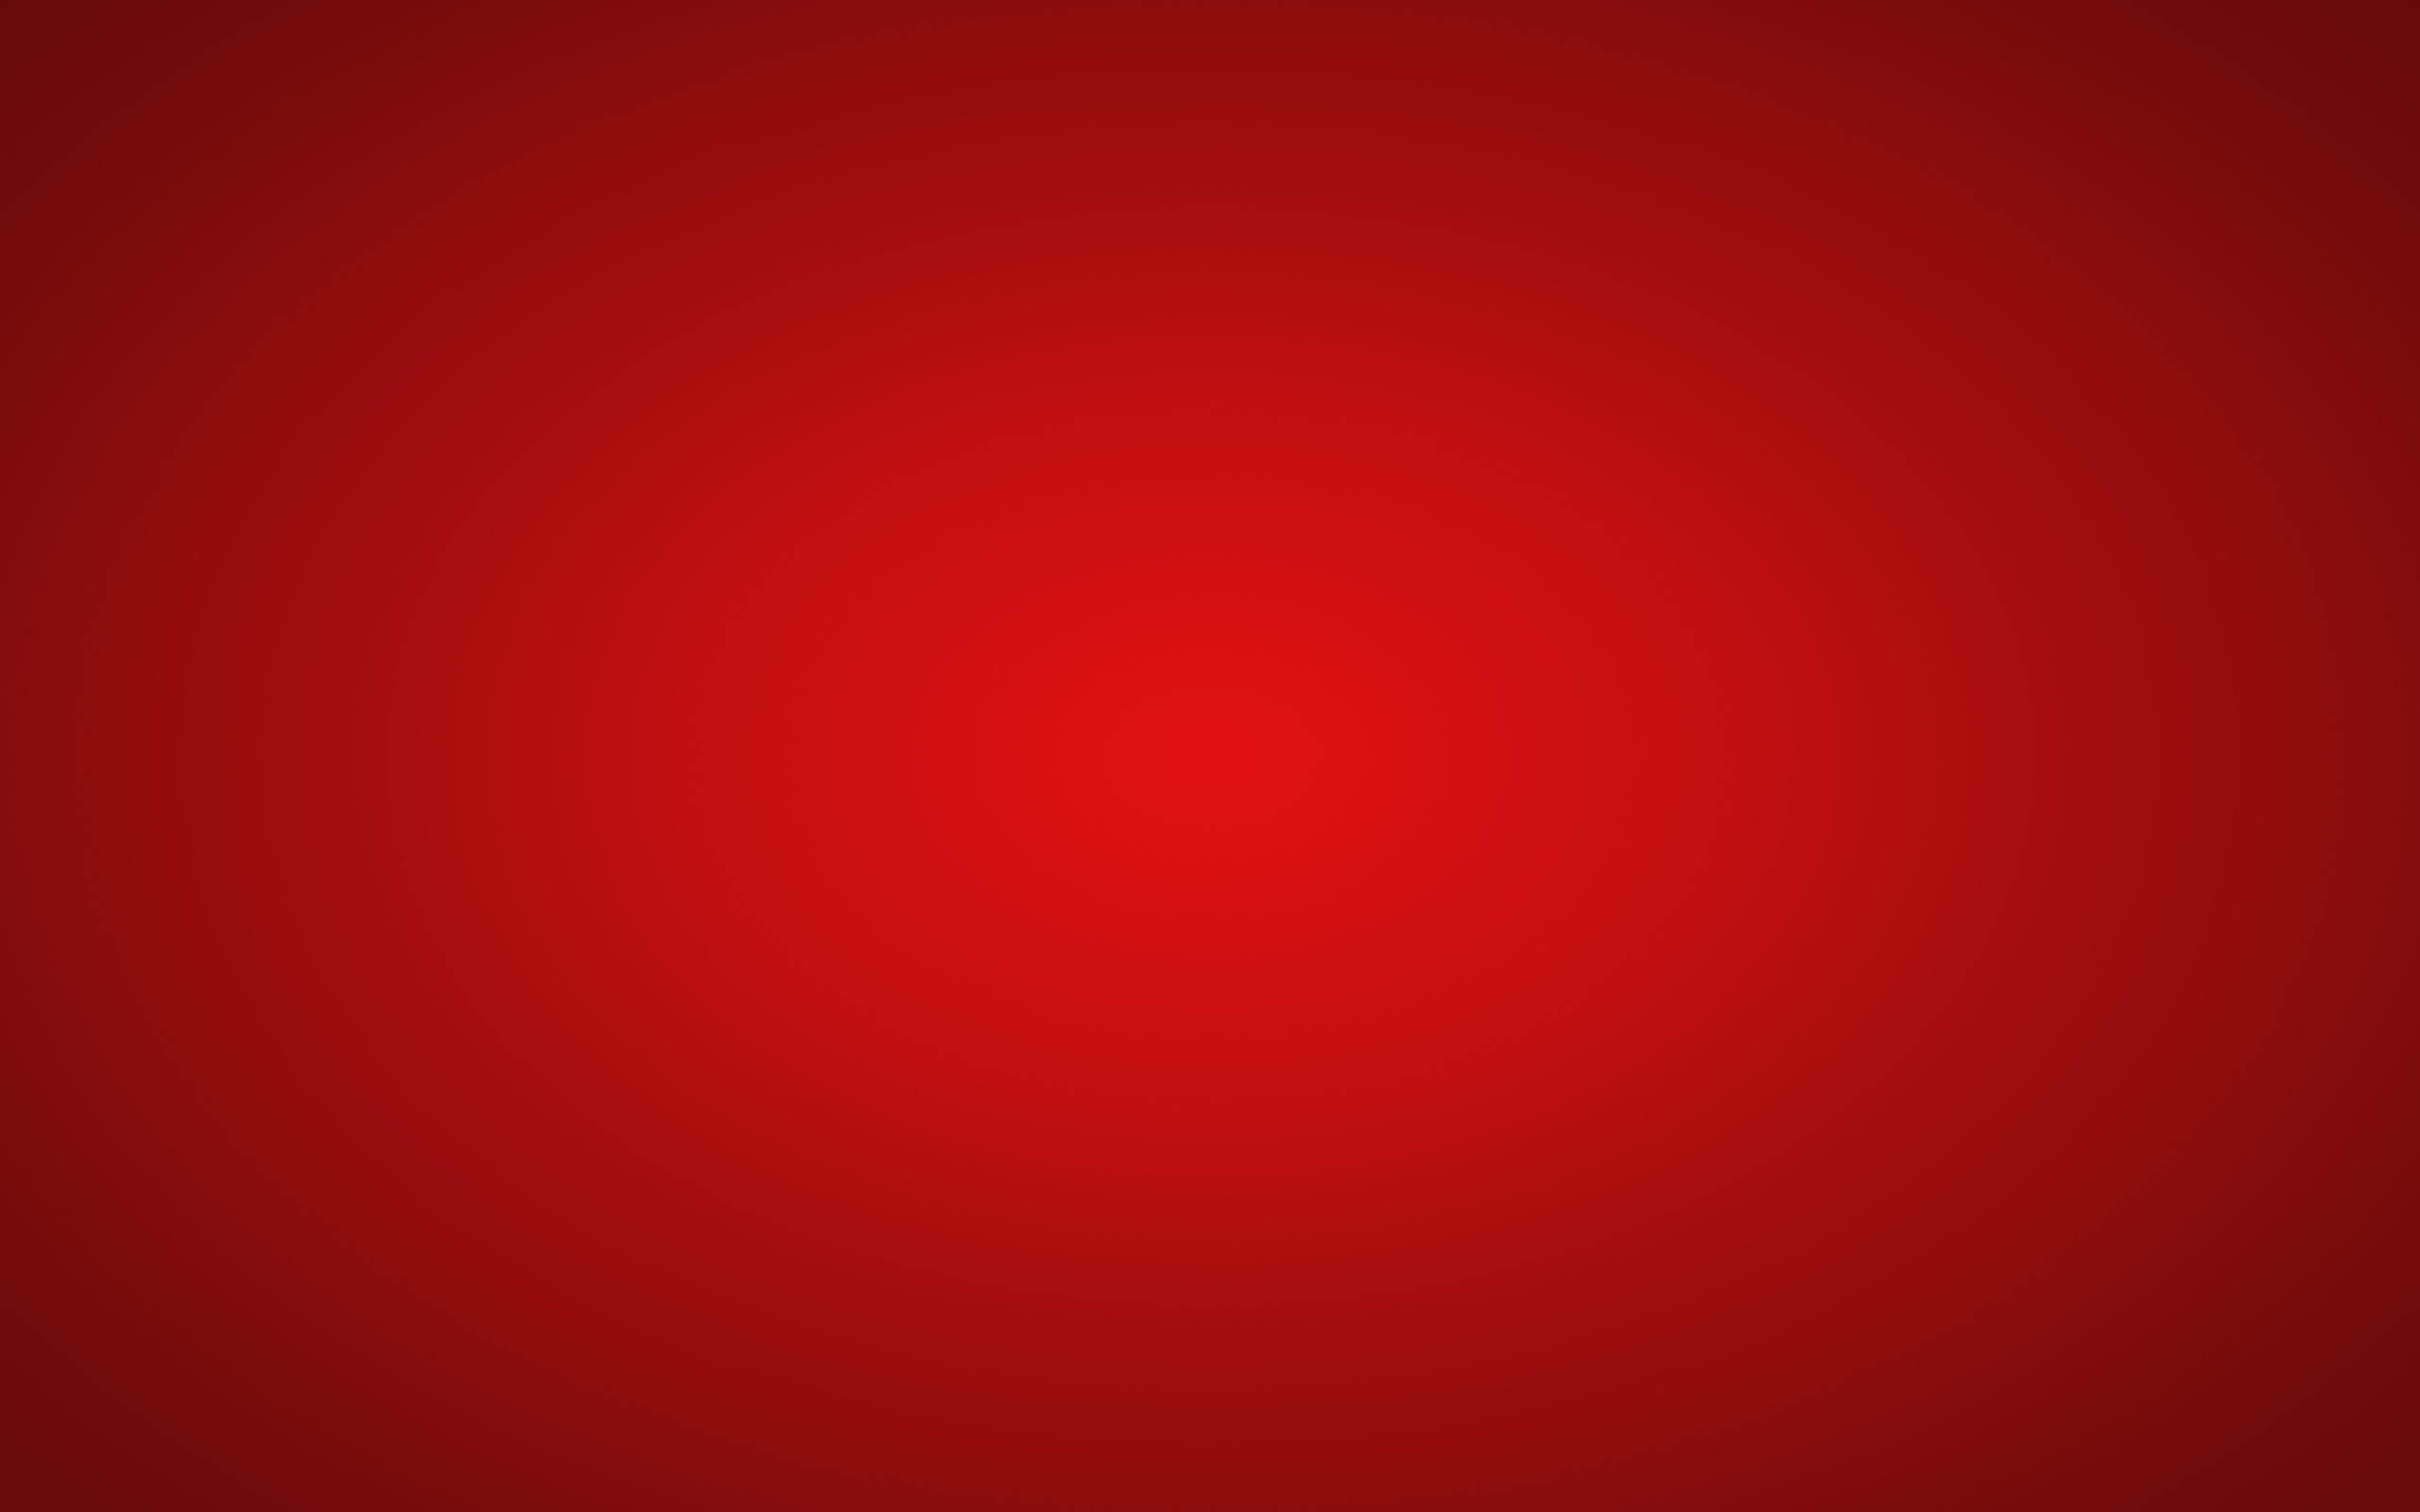 Red Wallpaper Wallpaper Trends Red Wallpaper Colorful Wallpaper Iphone Wallpaper